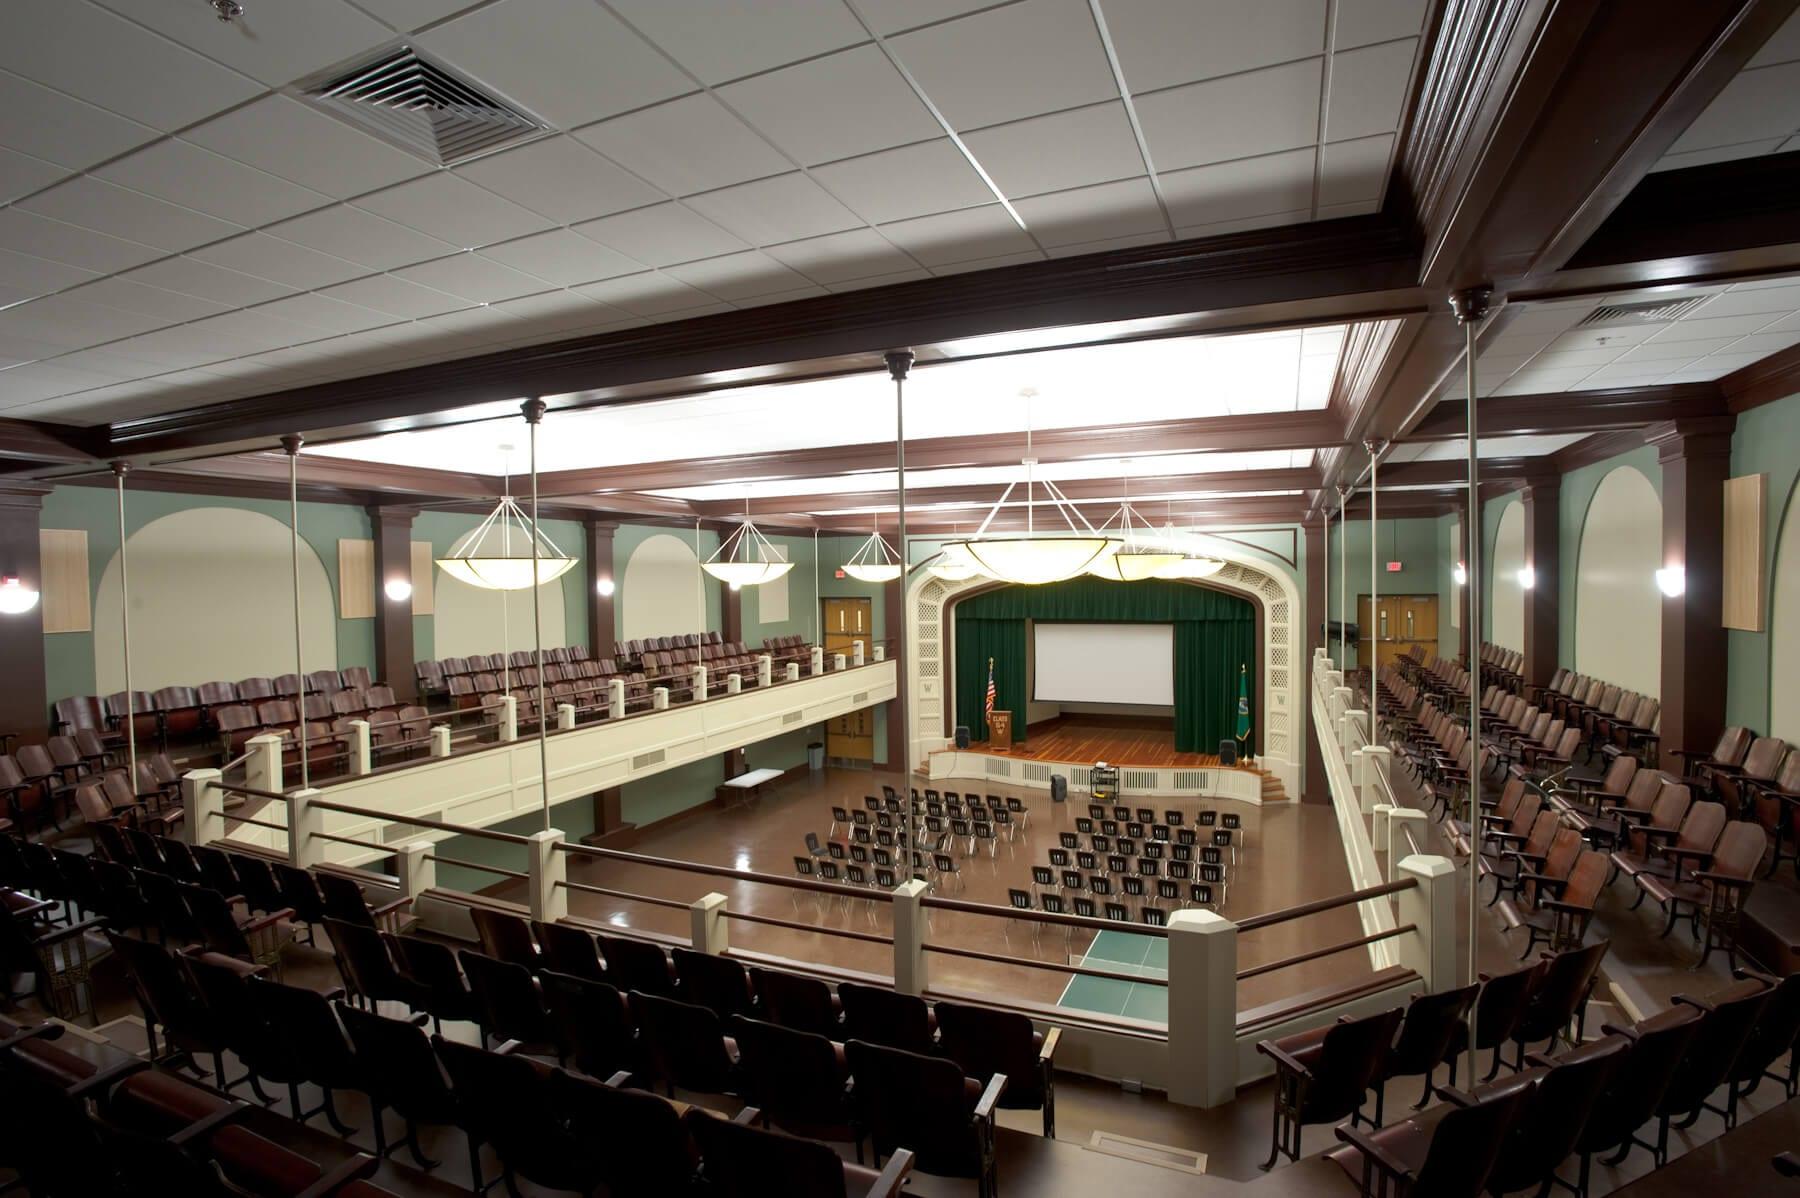 Expand Whatcom Middle School Auditorium